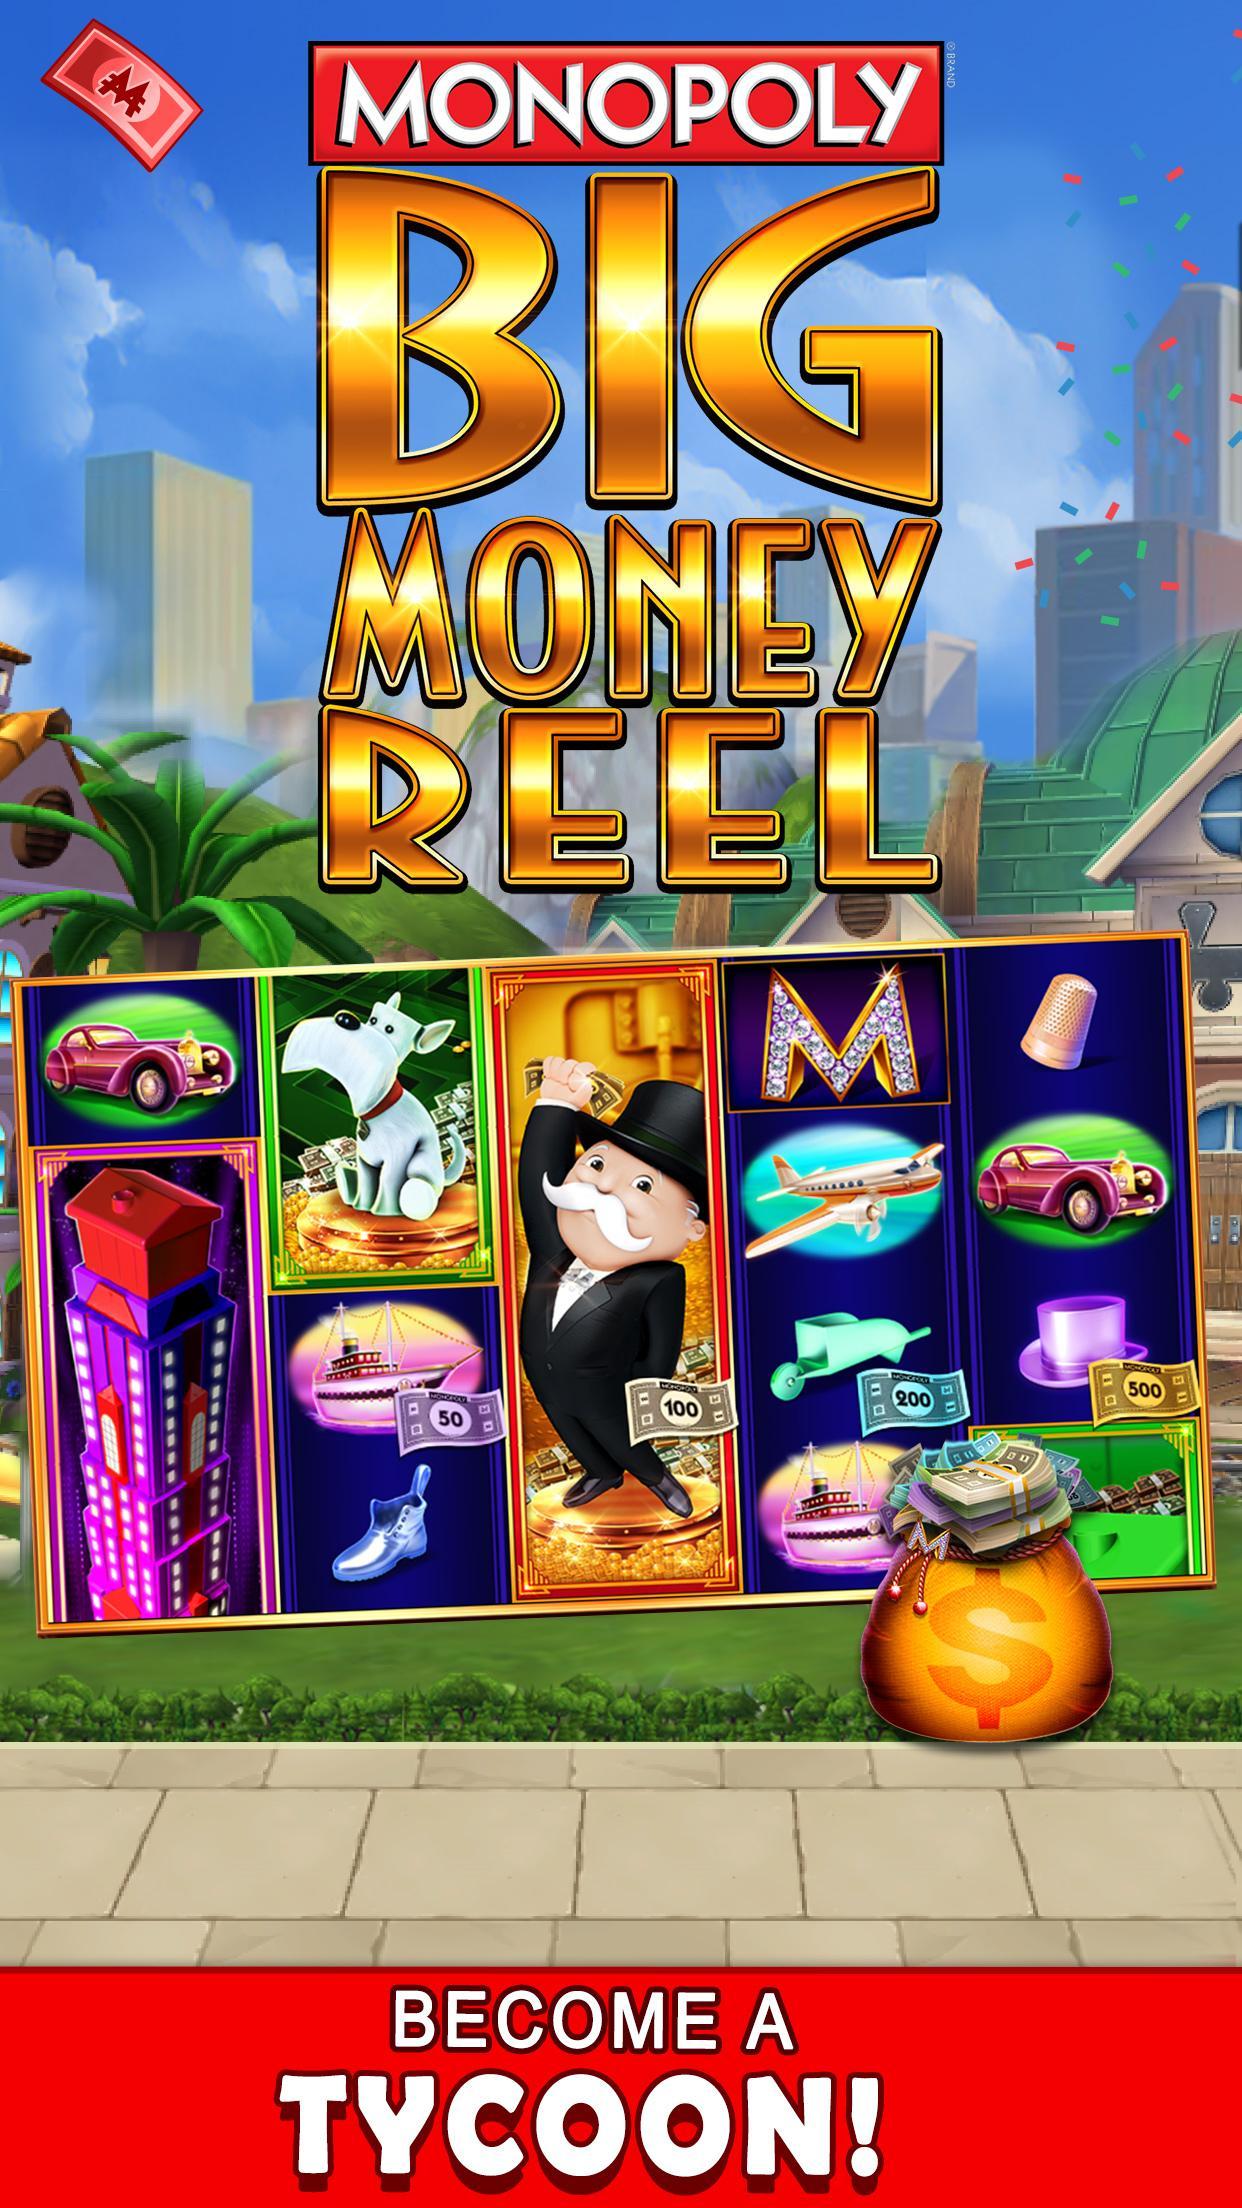 Monpoly casino